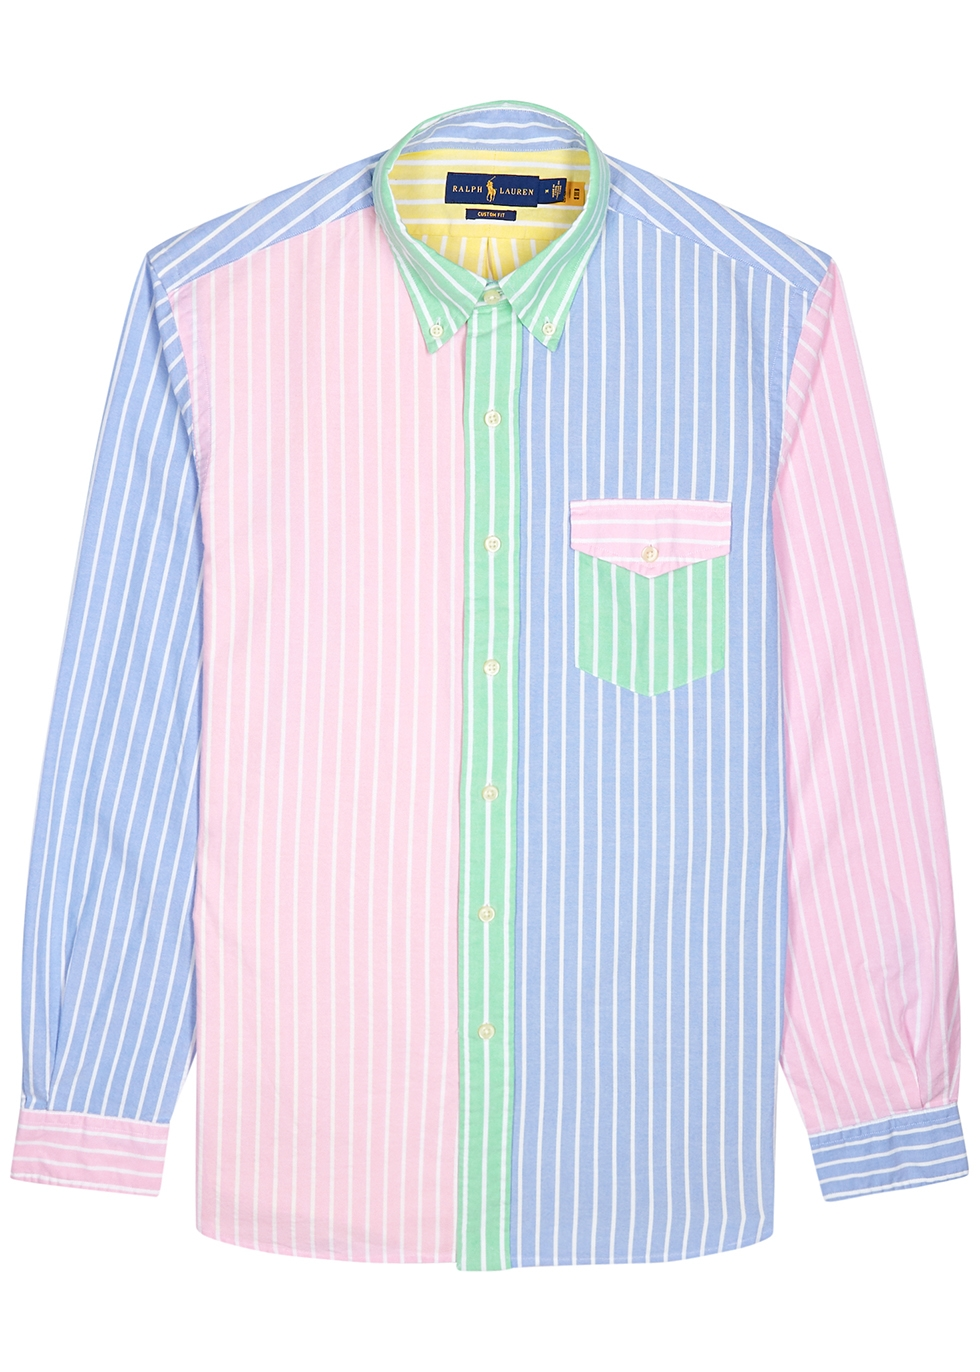 Striped custom cotton Oxford shirt